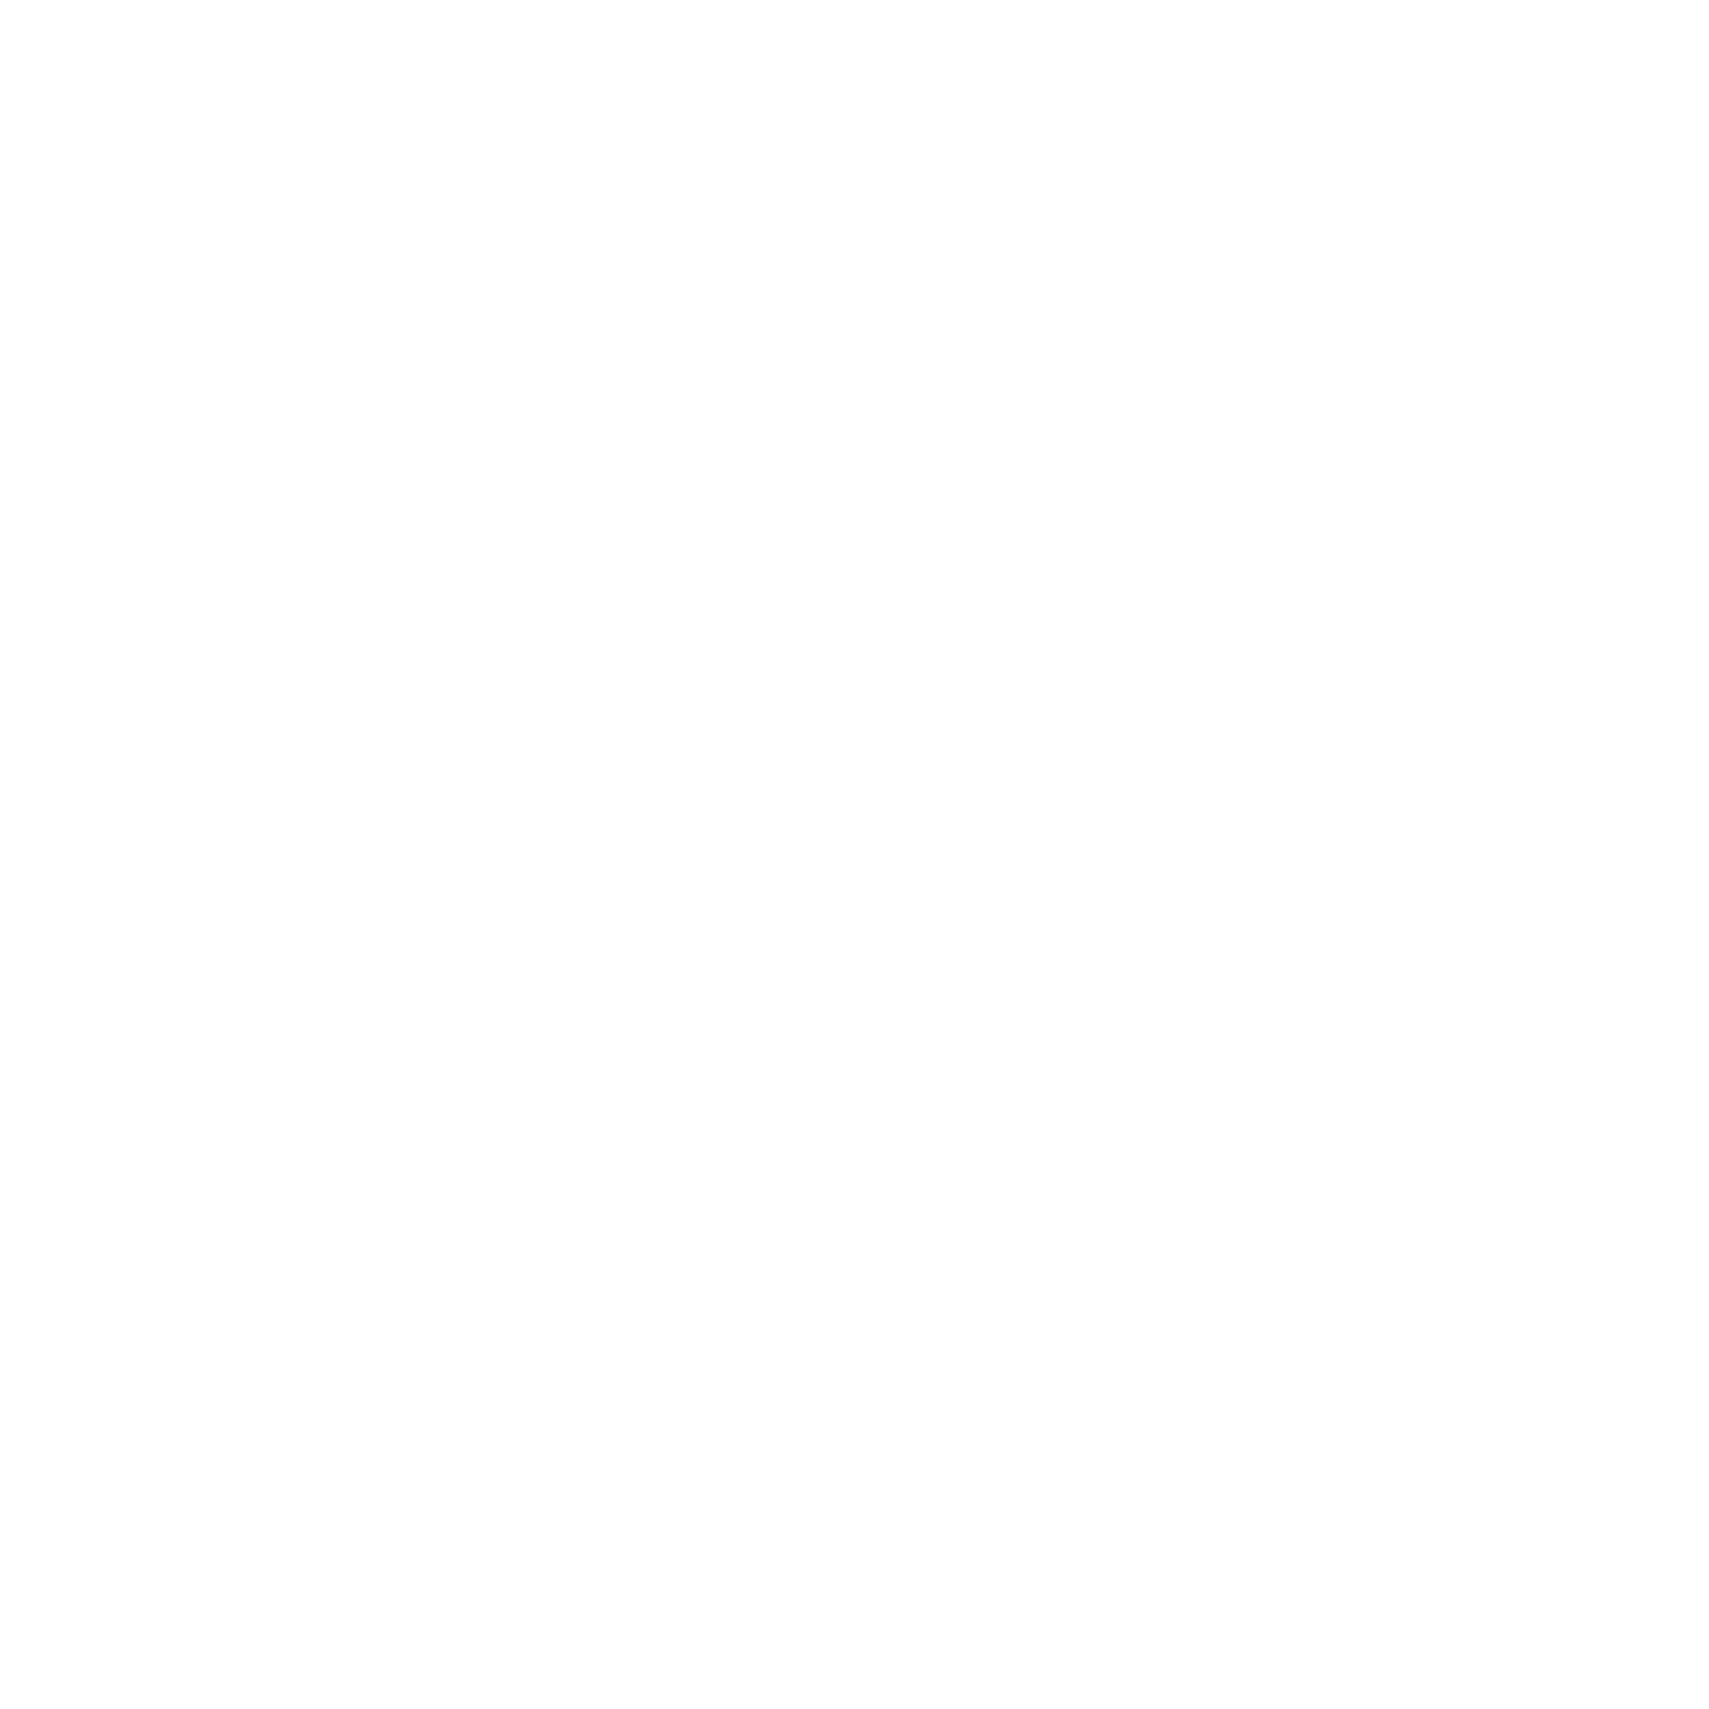 2021-03-08-043139093